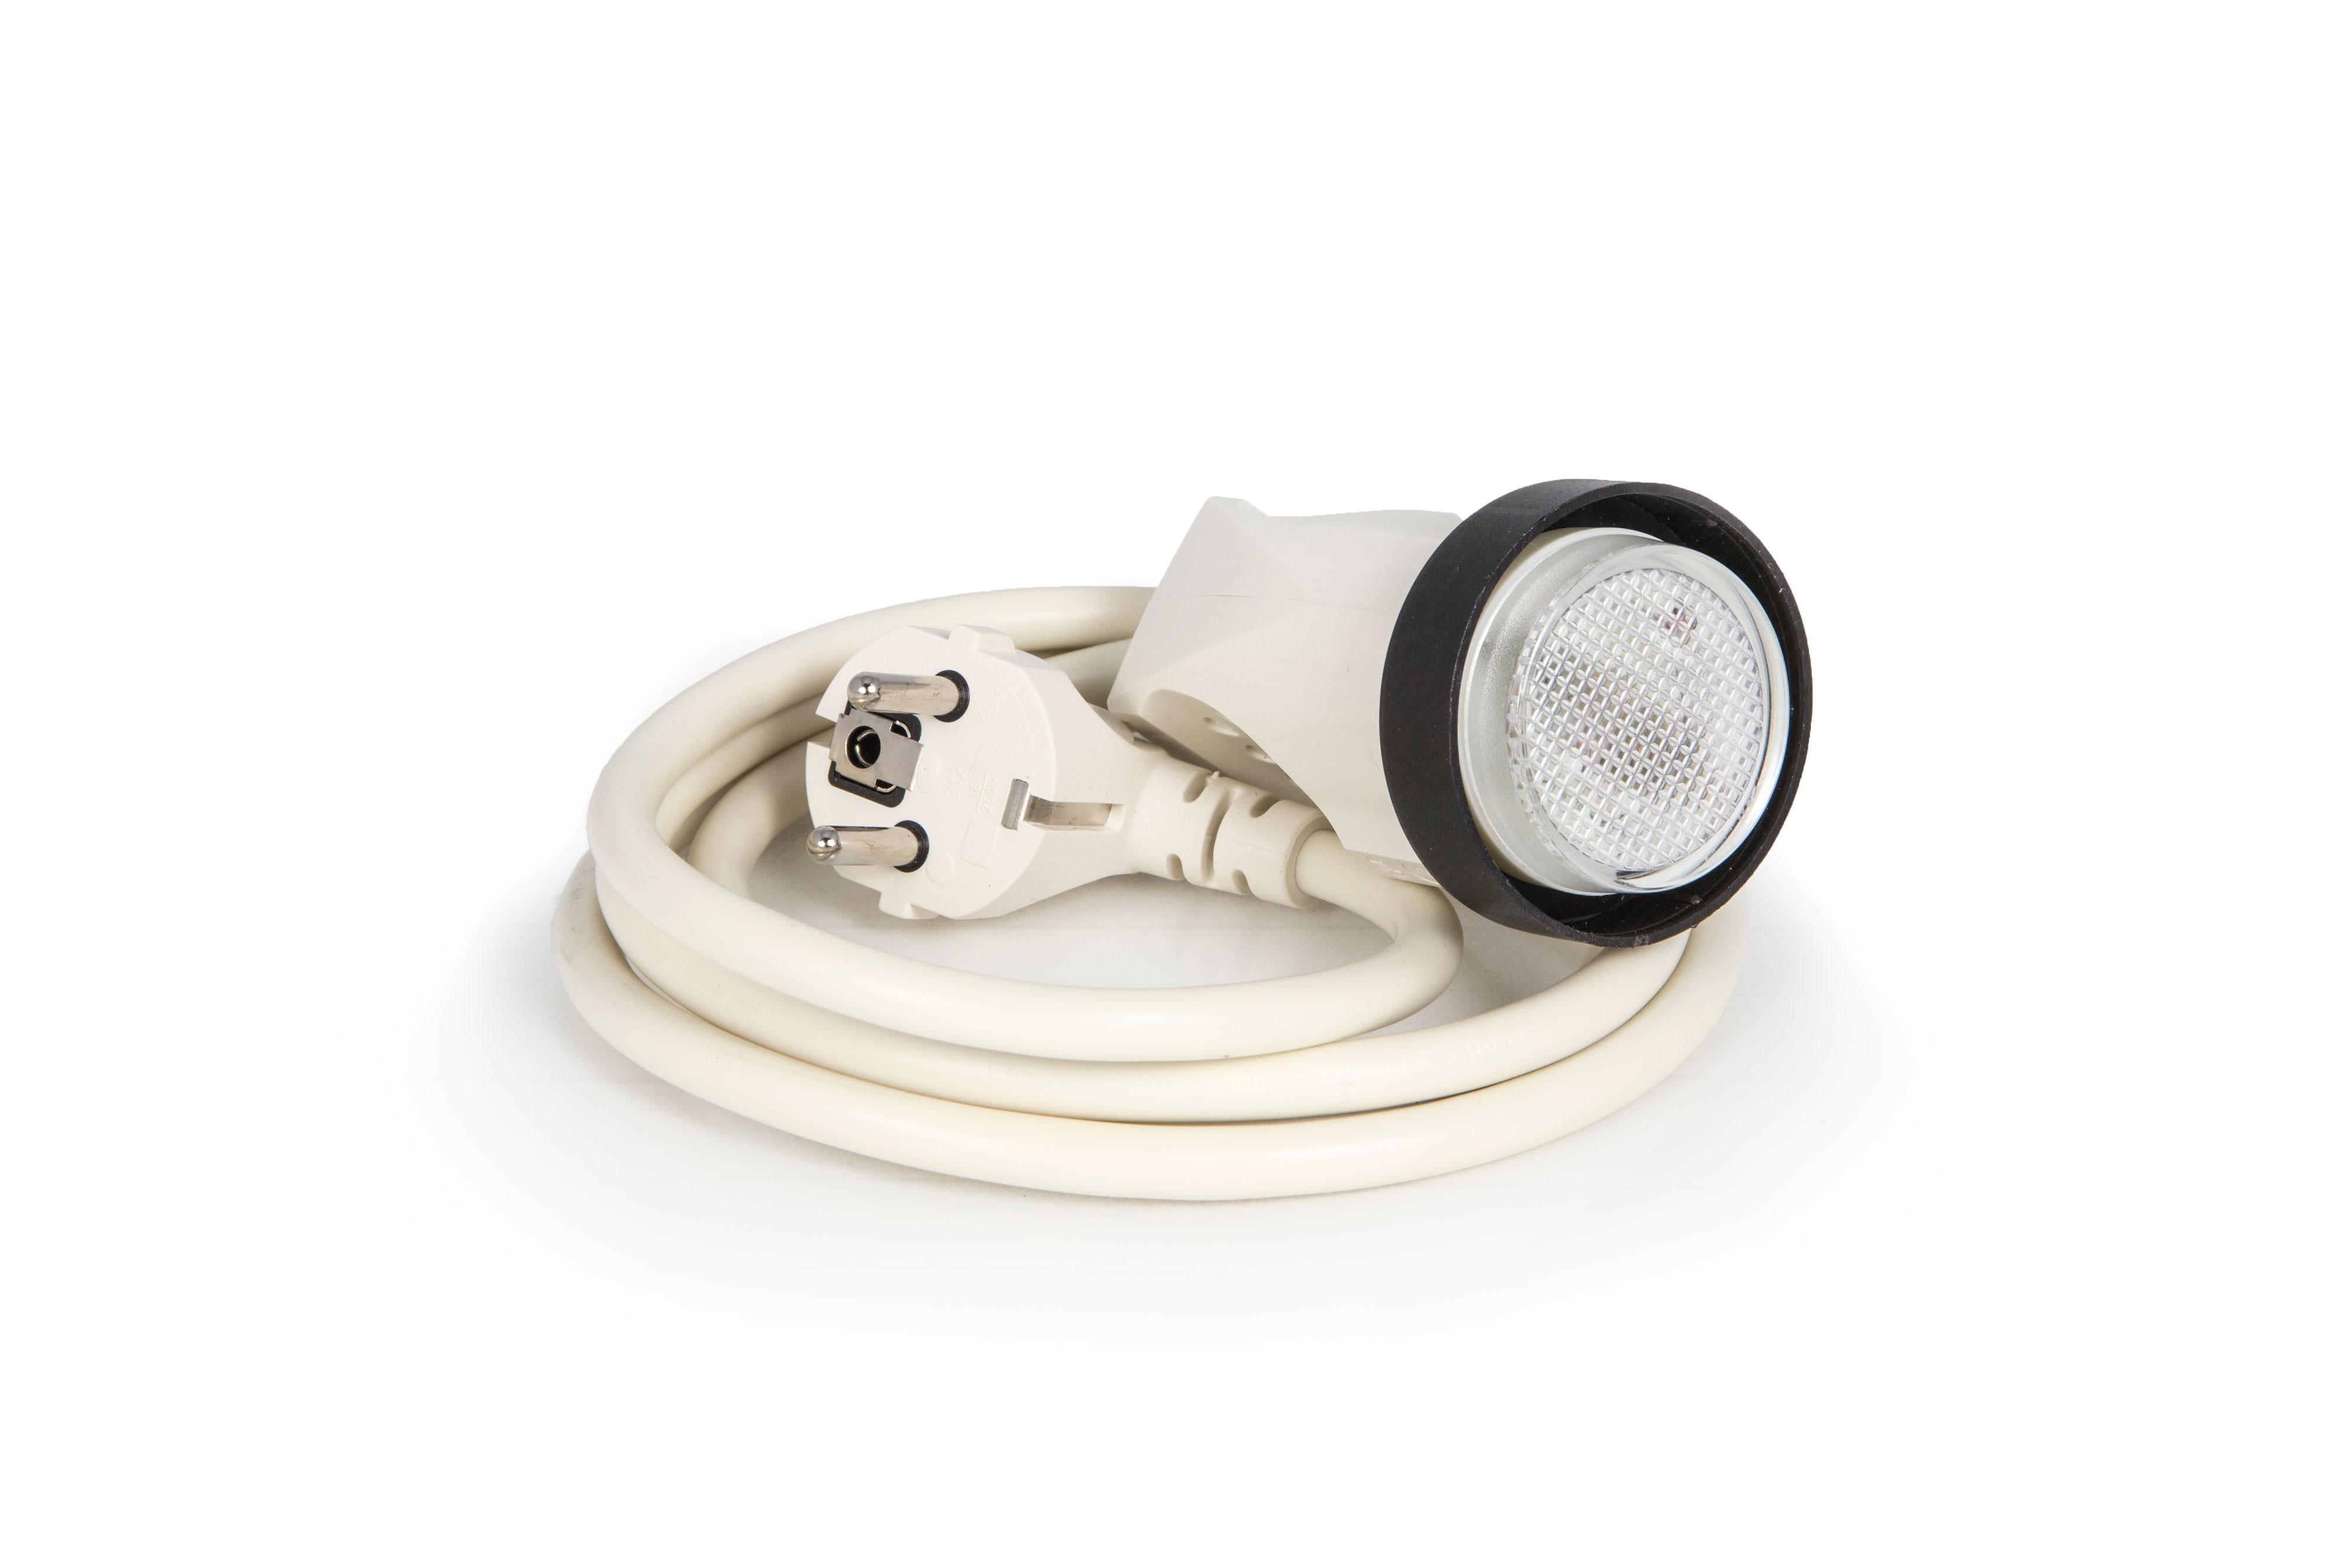 Baader Calibration lamp for DADOS